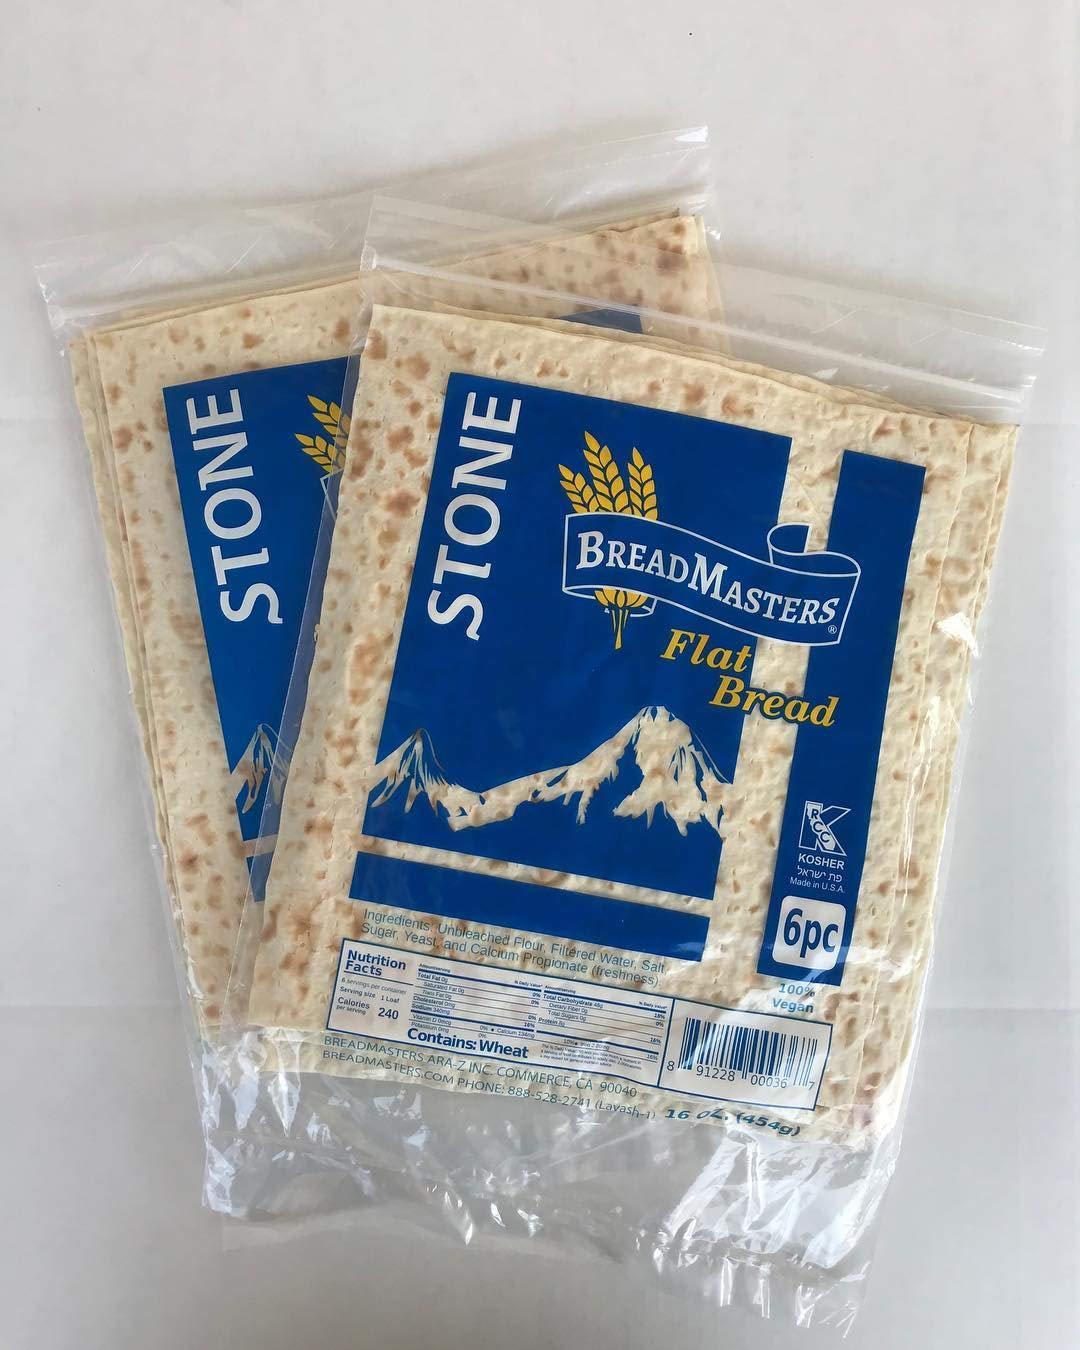 Ara-Z Stone Lavash Flat Bread 10 Packs of 6 (60 total) Cholesterol Free, GMO Free, Kosher by Breadmasters Ara-Z